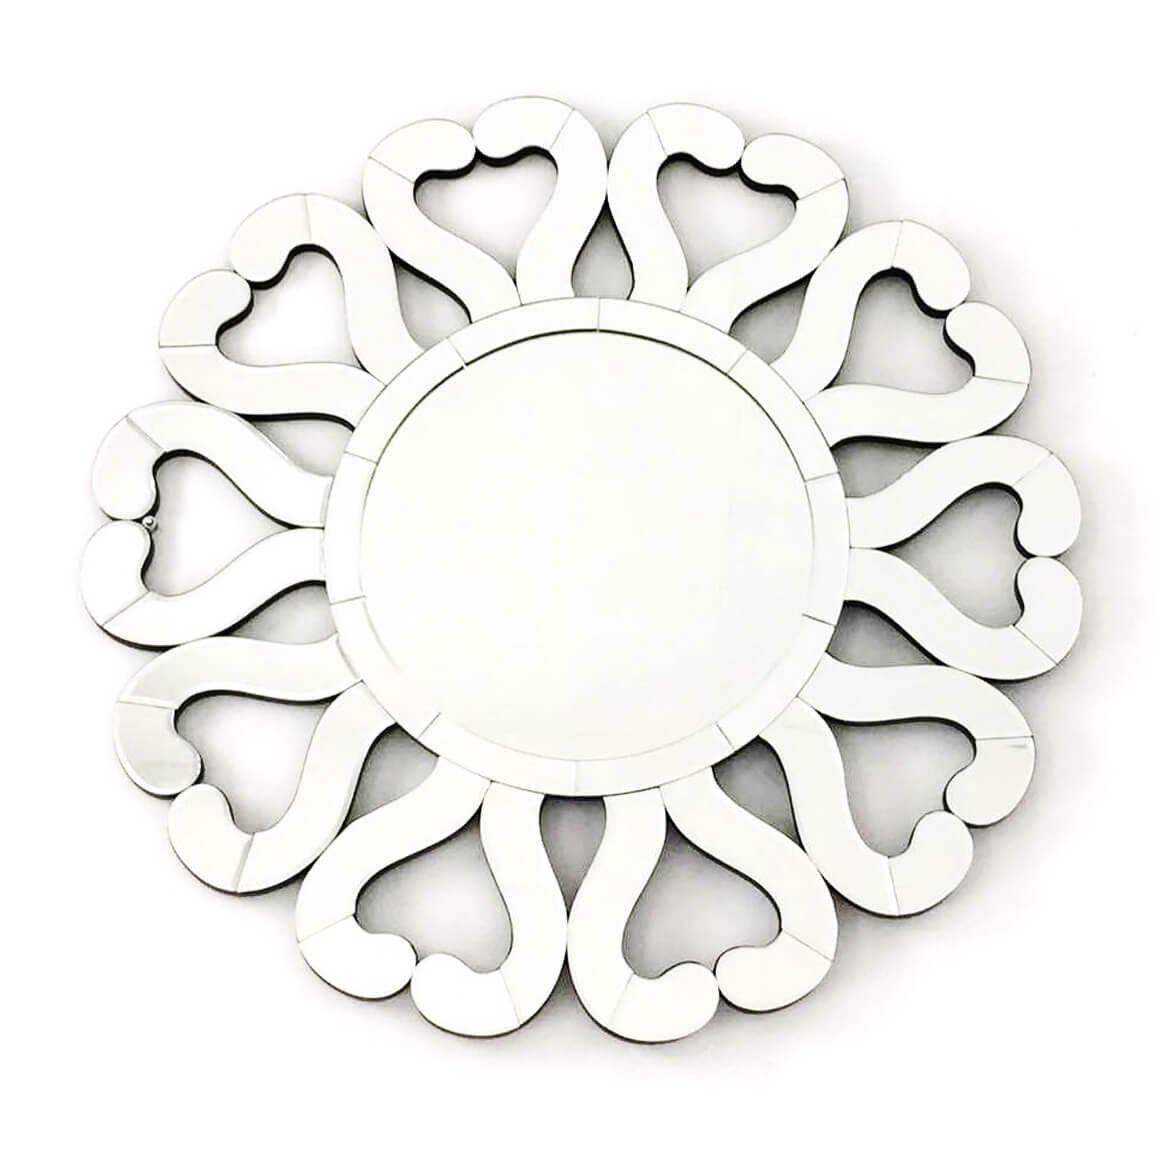 Fab Glass and Mirror FAB-WSTC013 DI Amore-Stylish Design L X W 31.5 Decorative Sunburst, Bathroom Wall Mirrors, 31-1/2'' by Fab Glass and Mirror